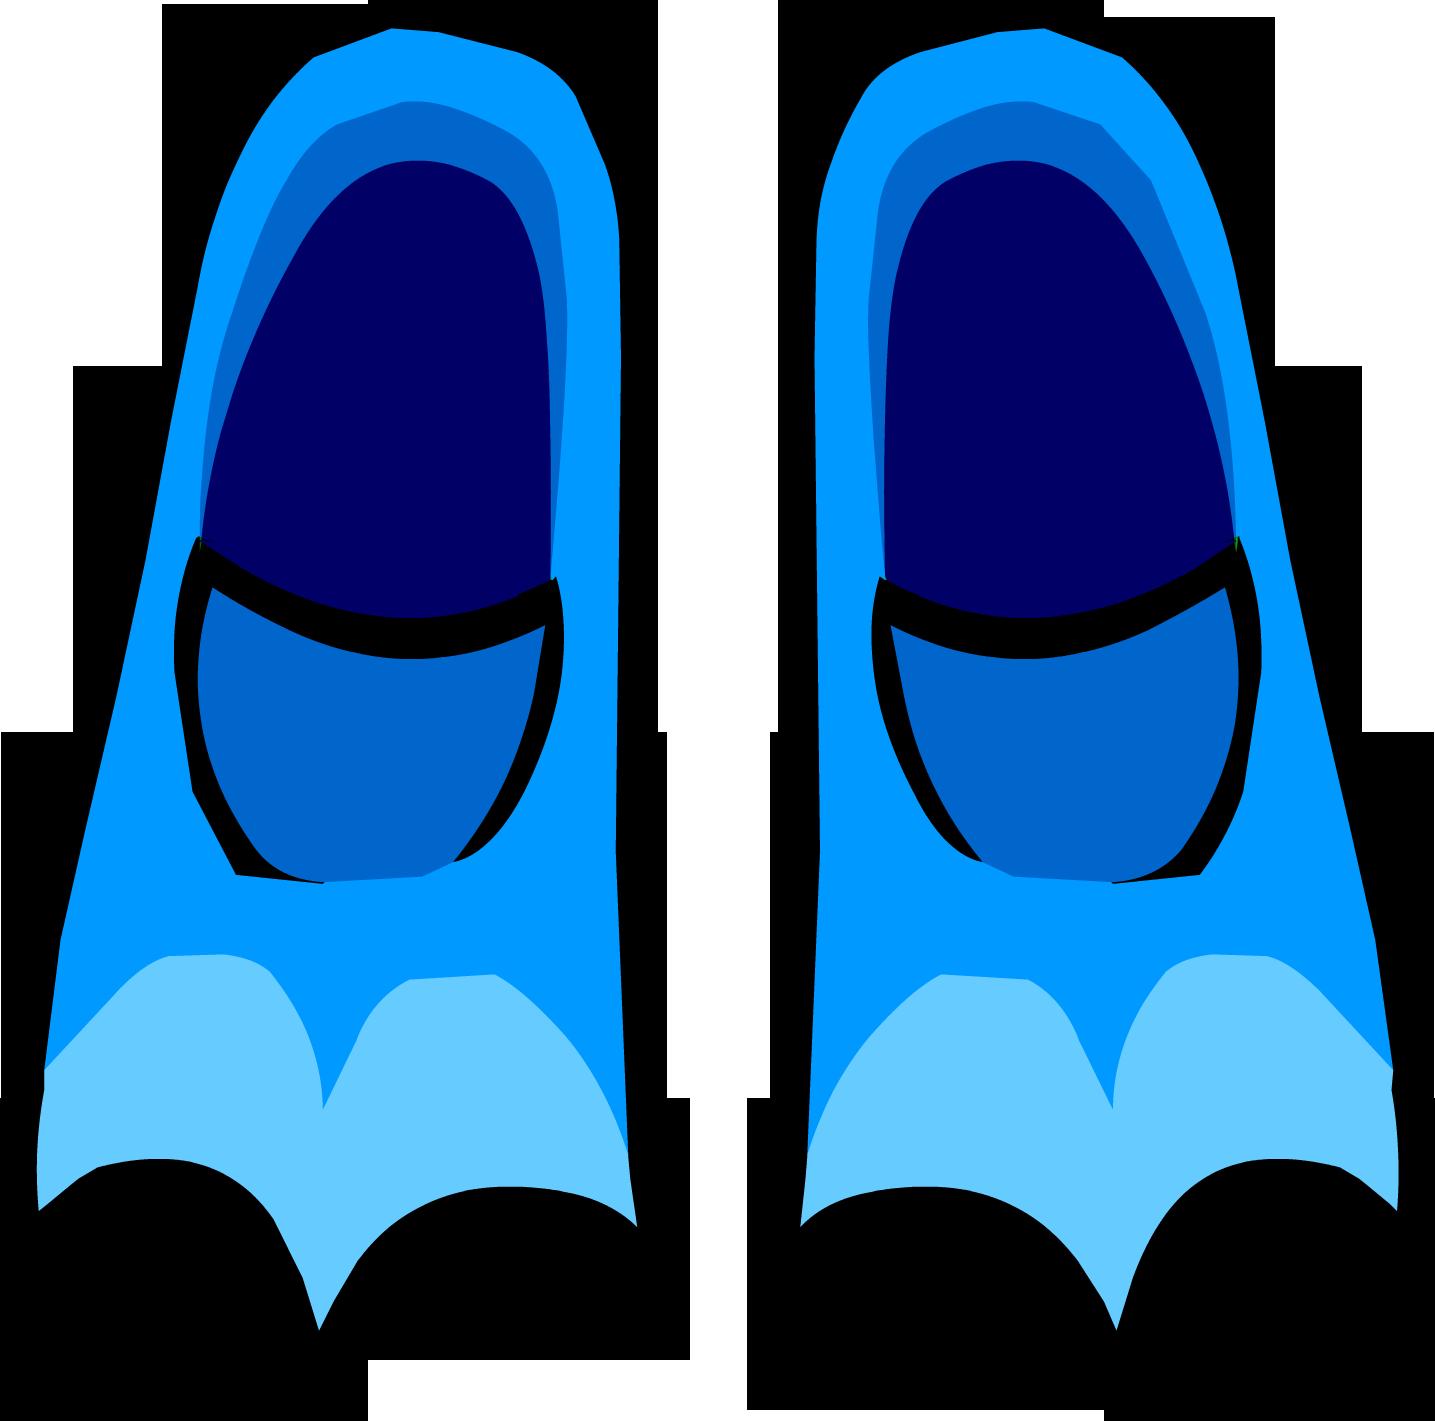 Blue flippers club wiki. Clipart penquin penguin flipper